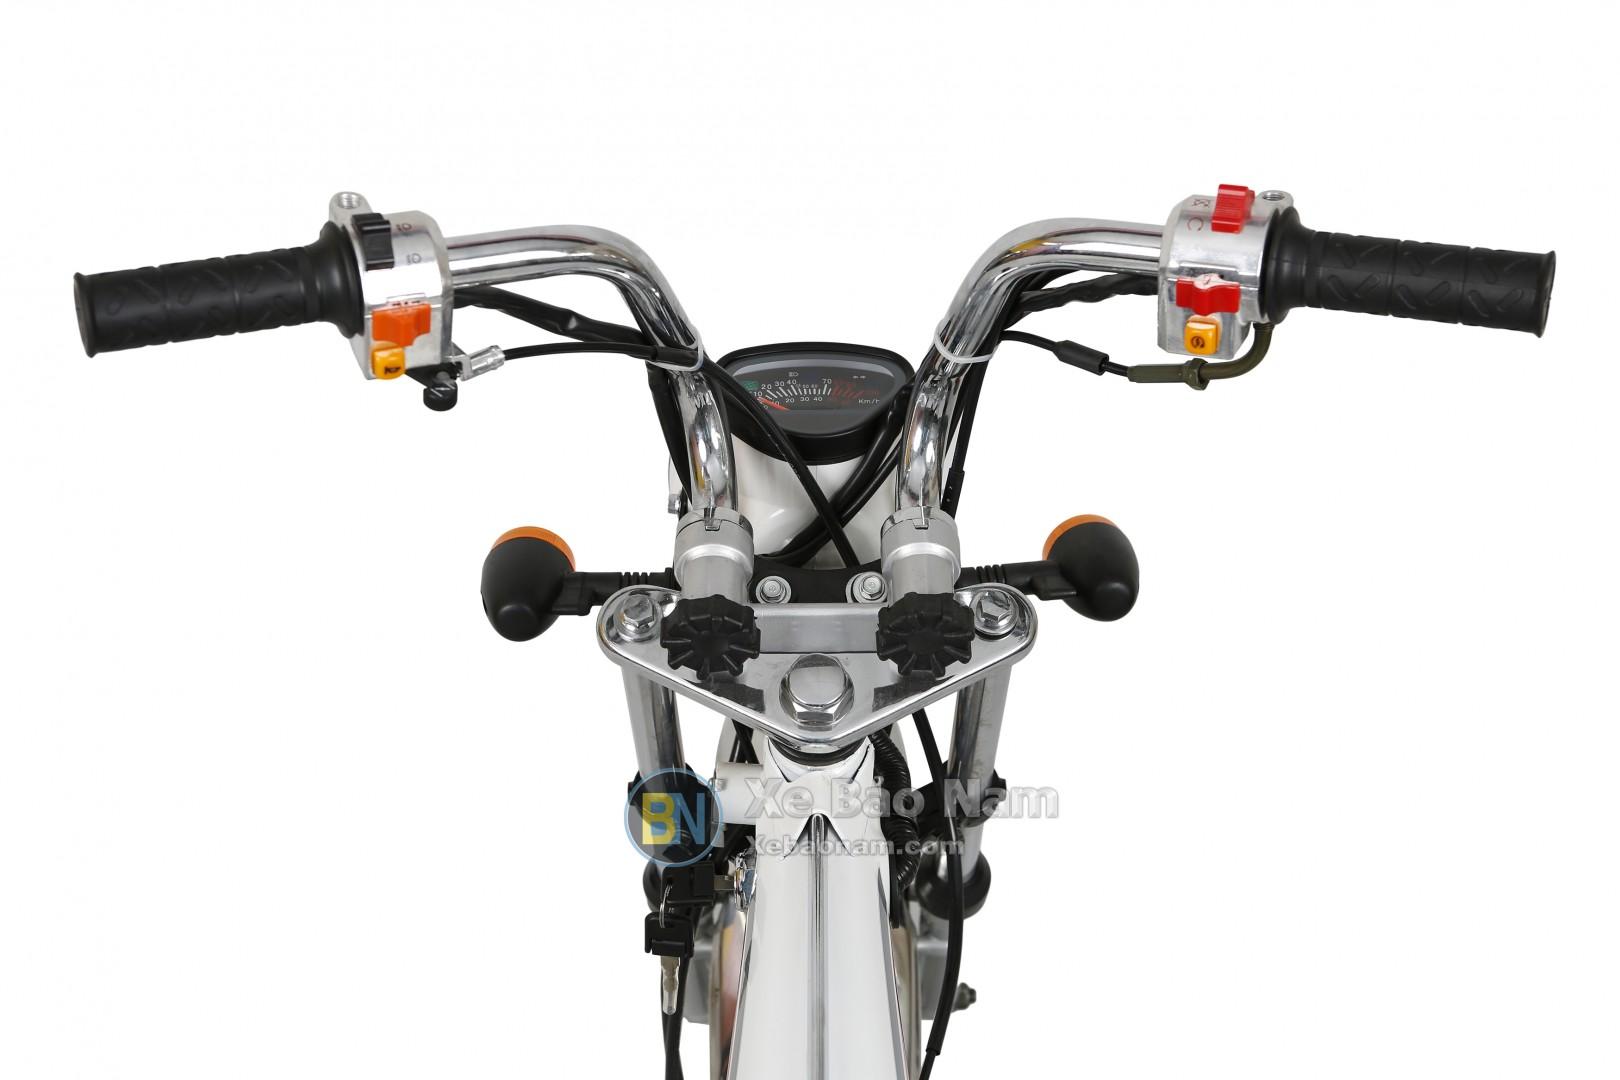 xe-honda-dax-50-xebaonam-13